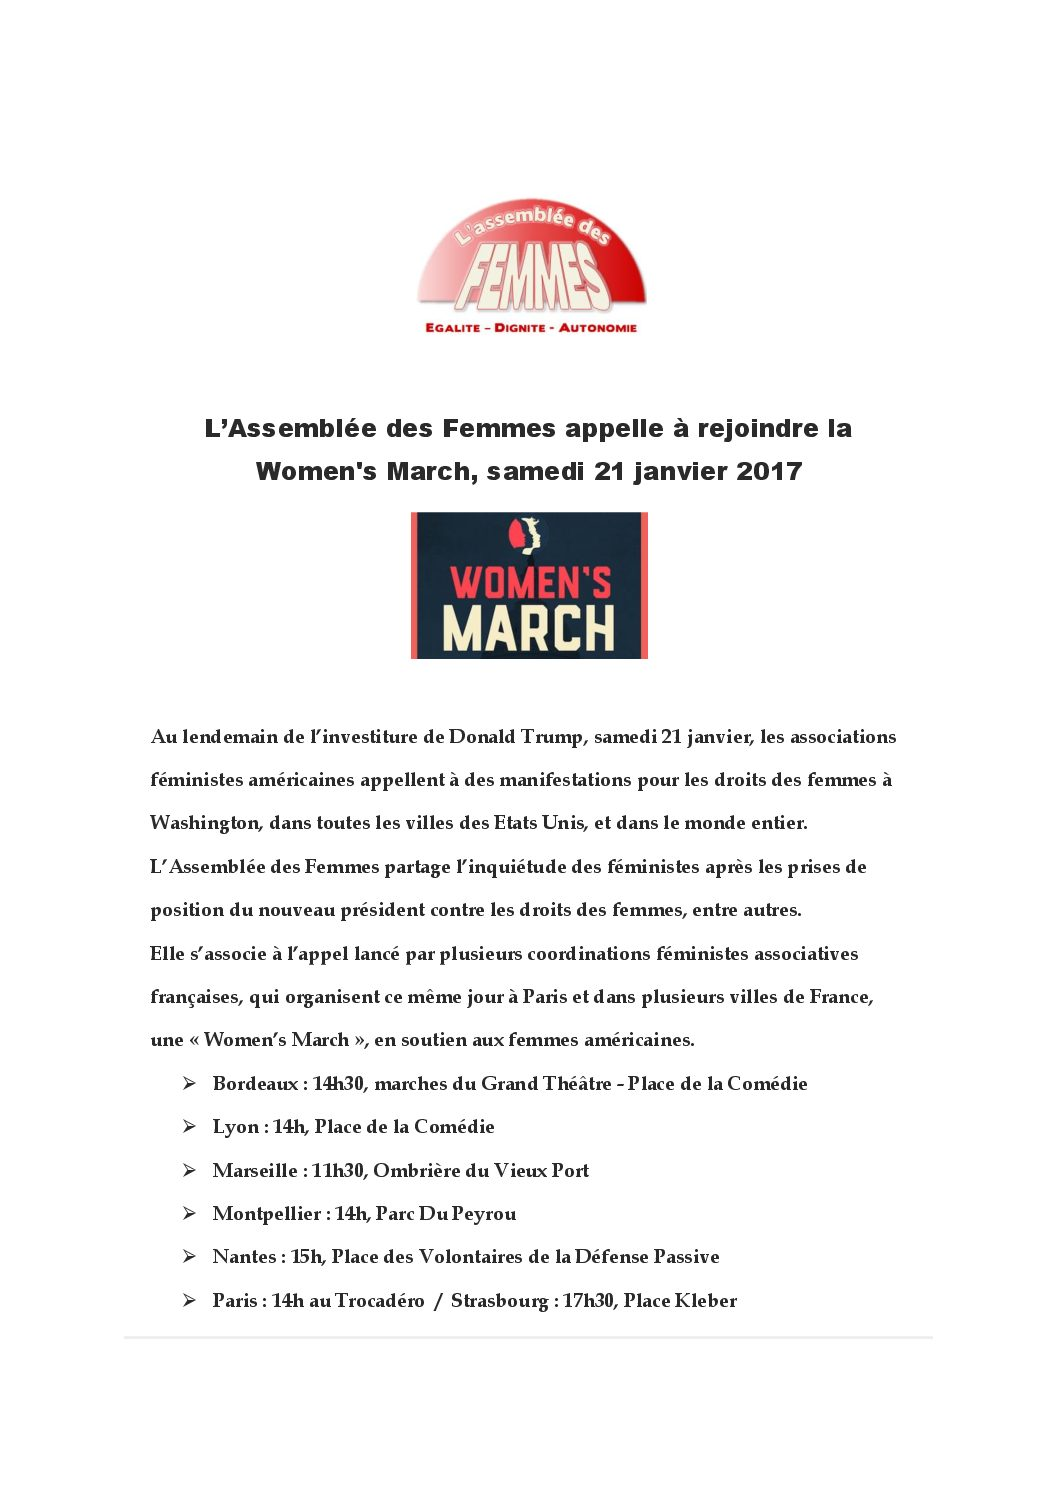 Rejoignez la Women's March, samedi 21 janvier 2017